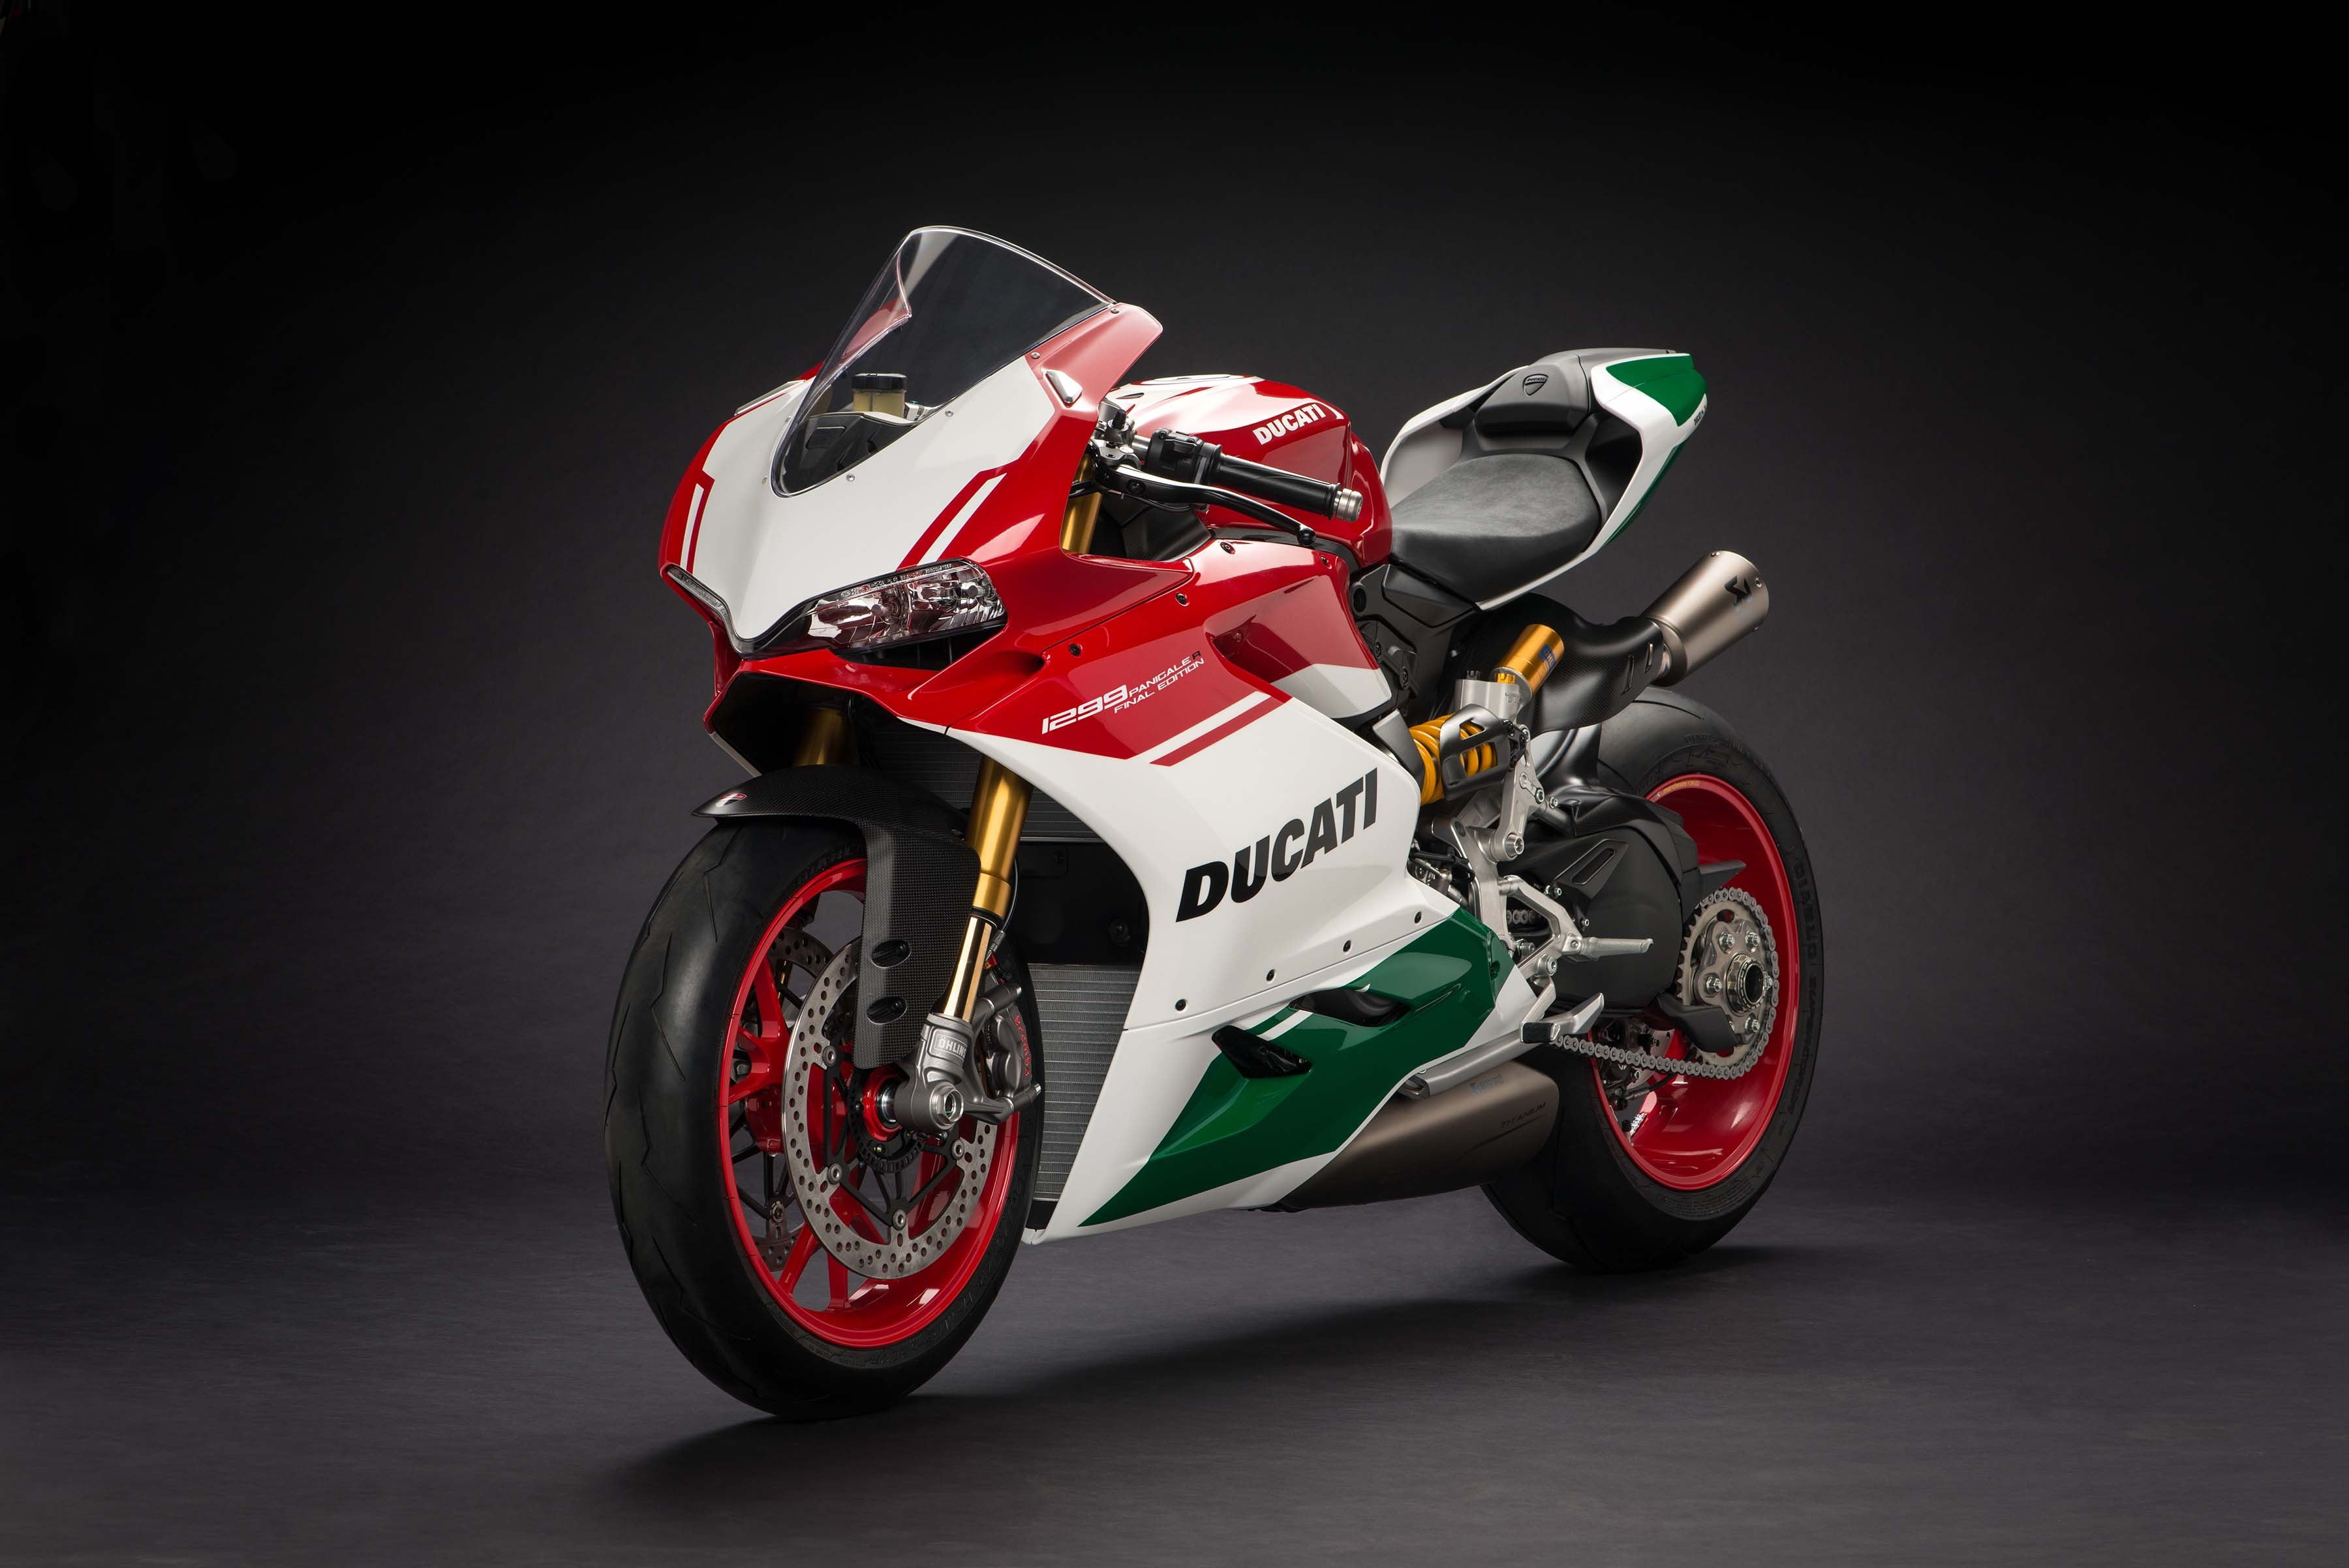 Red green and white Ducati sports bike HD wallpaper Wallpaper 3600x2403